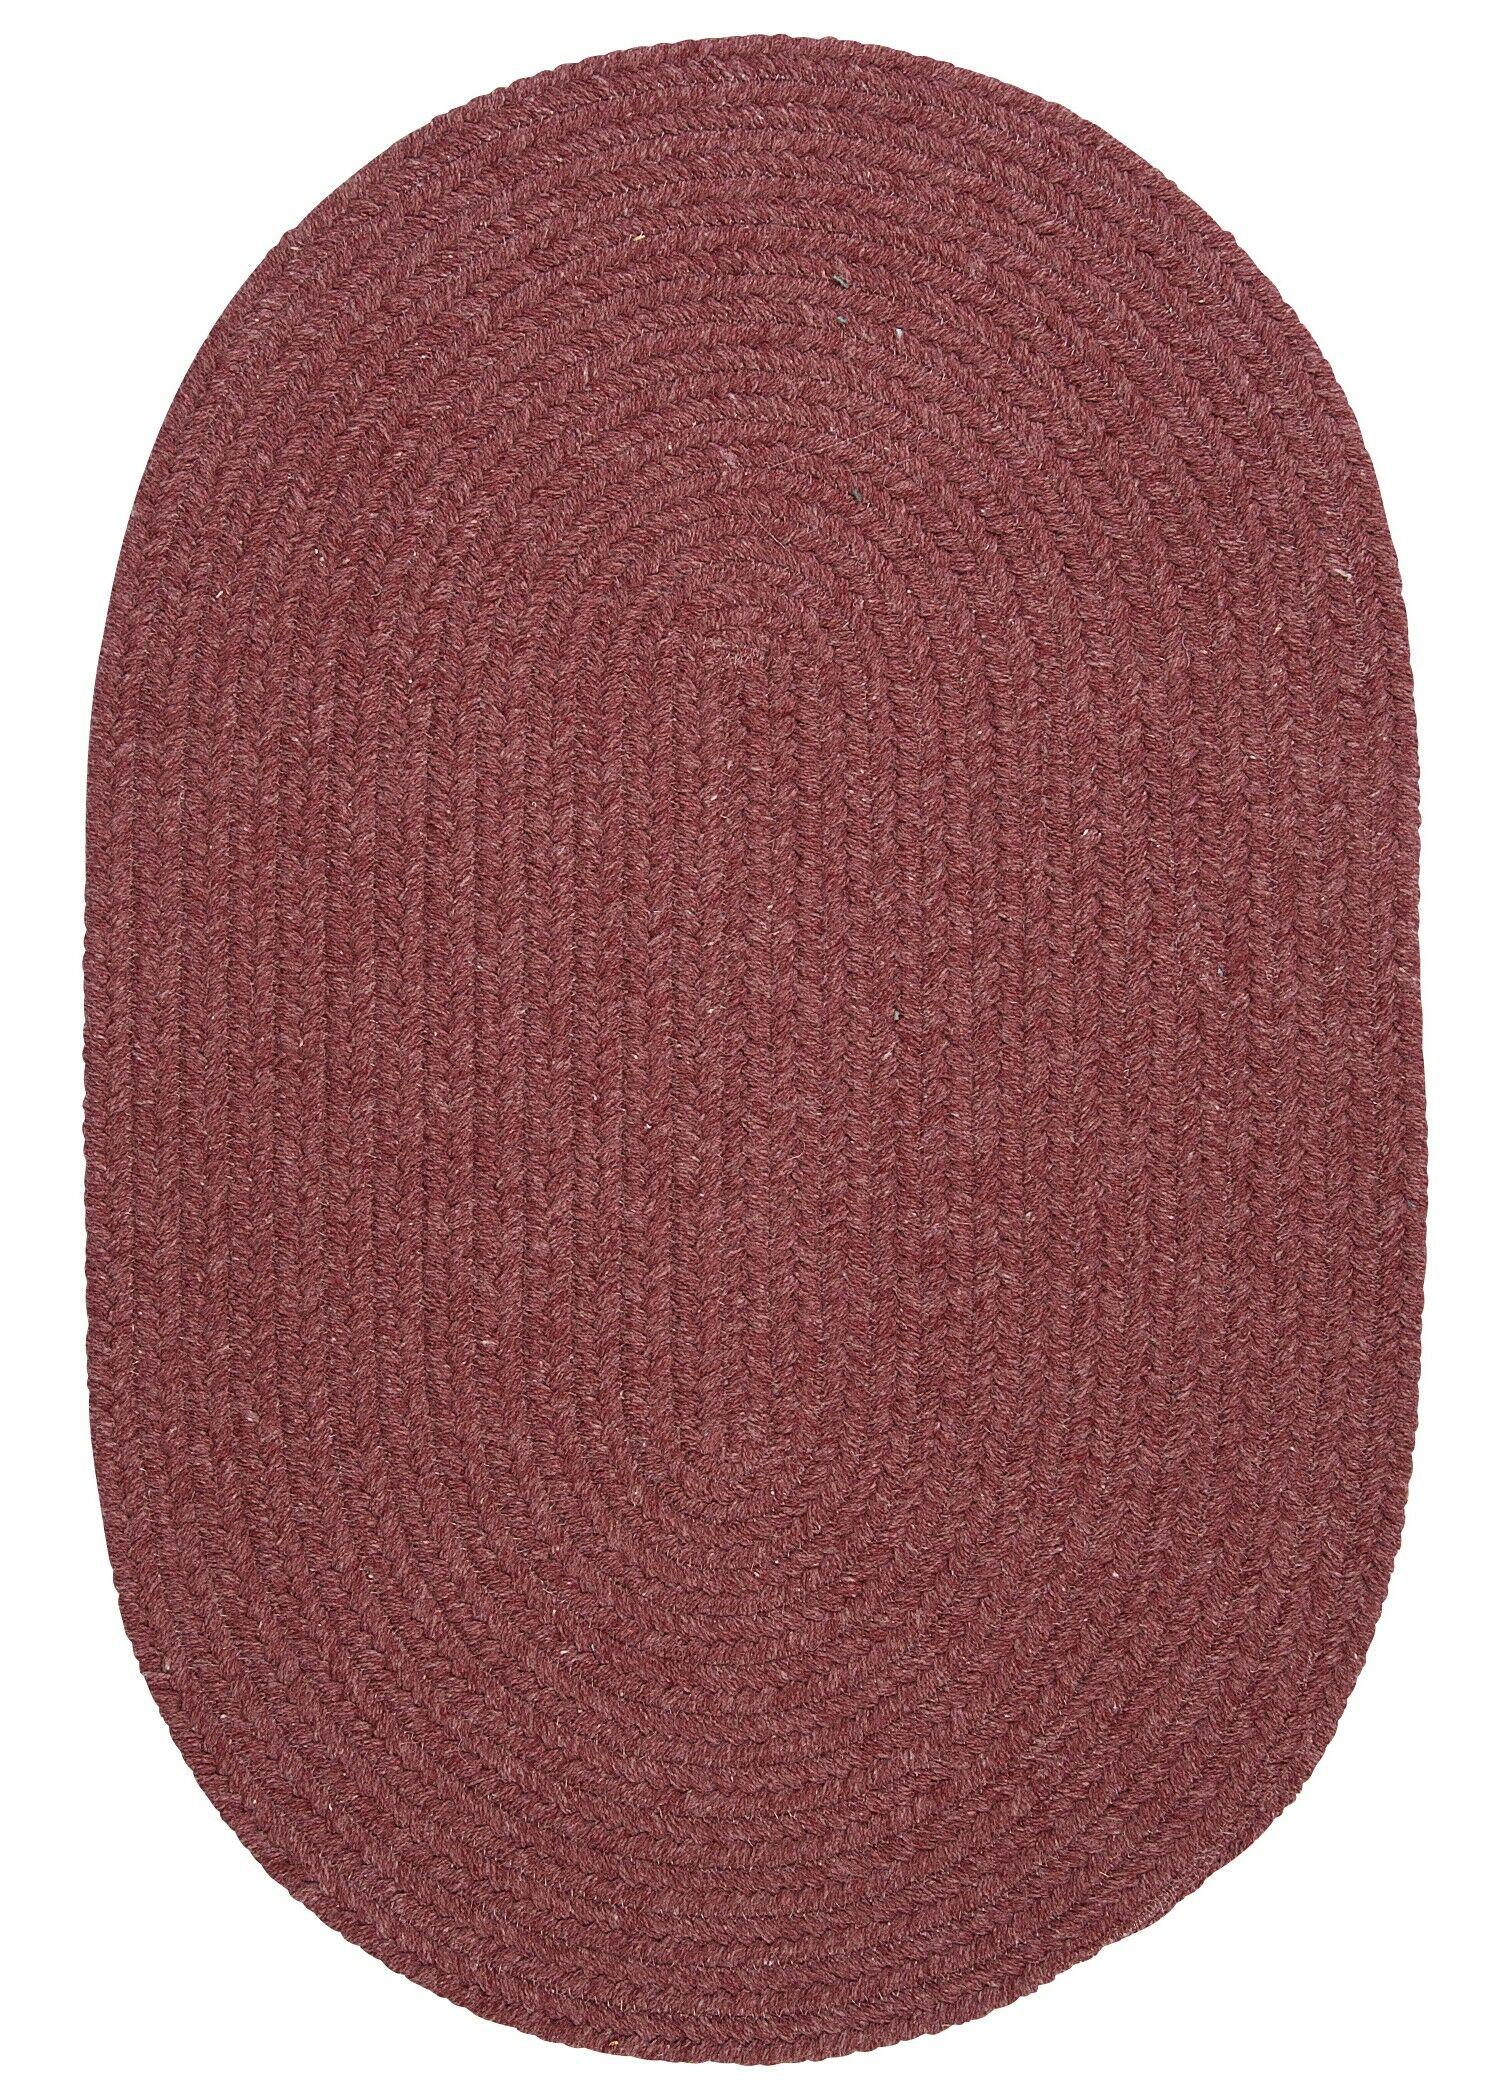 Navarrette Mauve Area Rug Rug Size: Round 6'